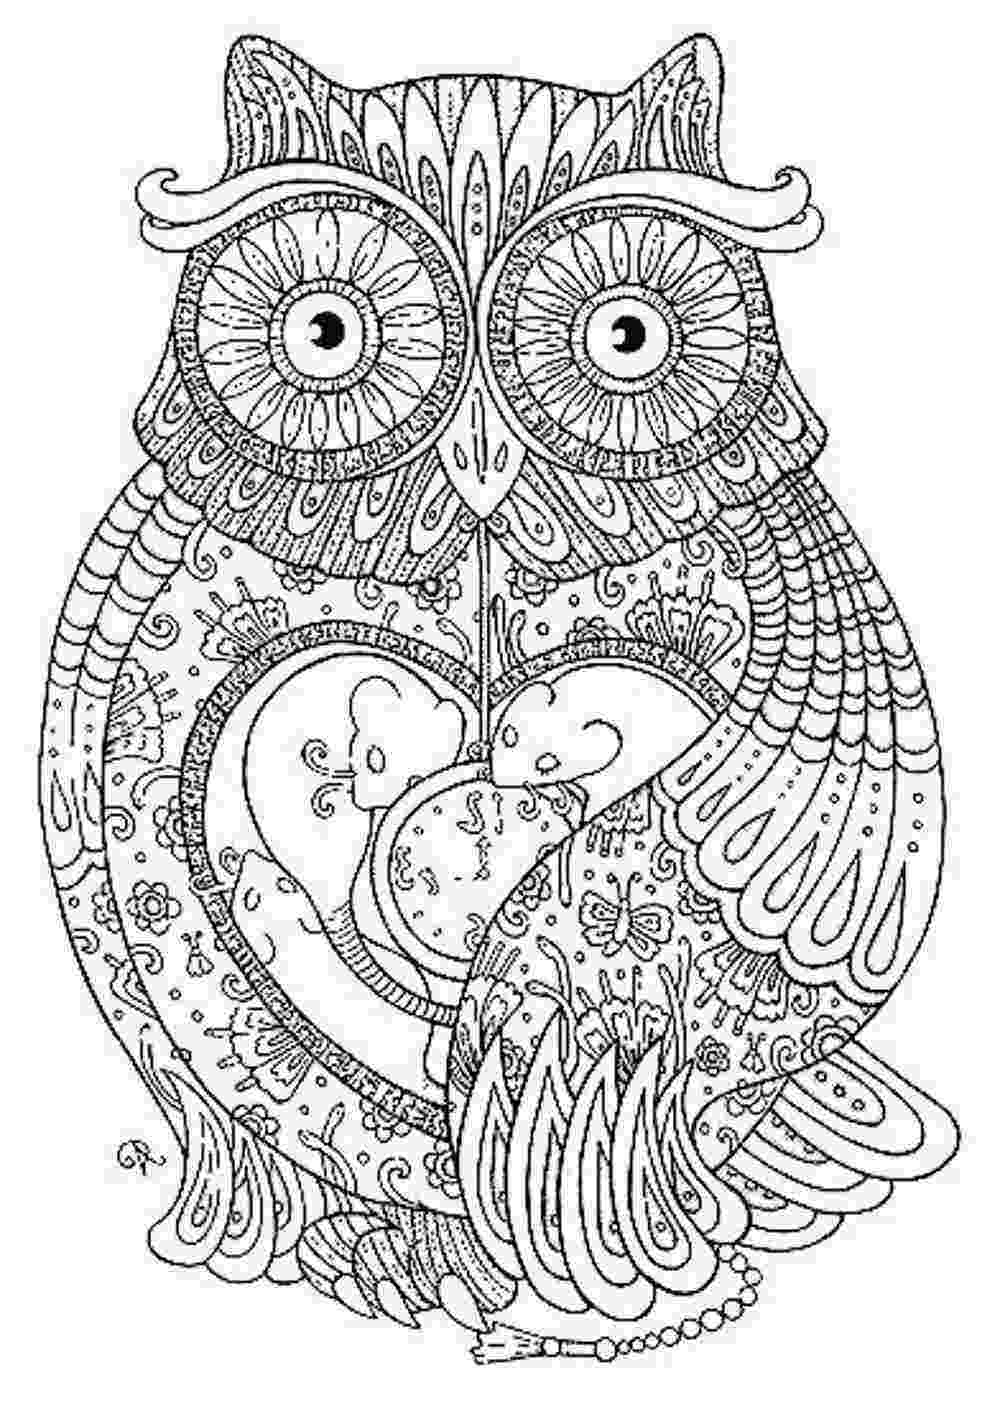 free mandalas to print animal mandala coloring pages to download and print for free mandalas to print free